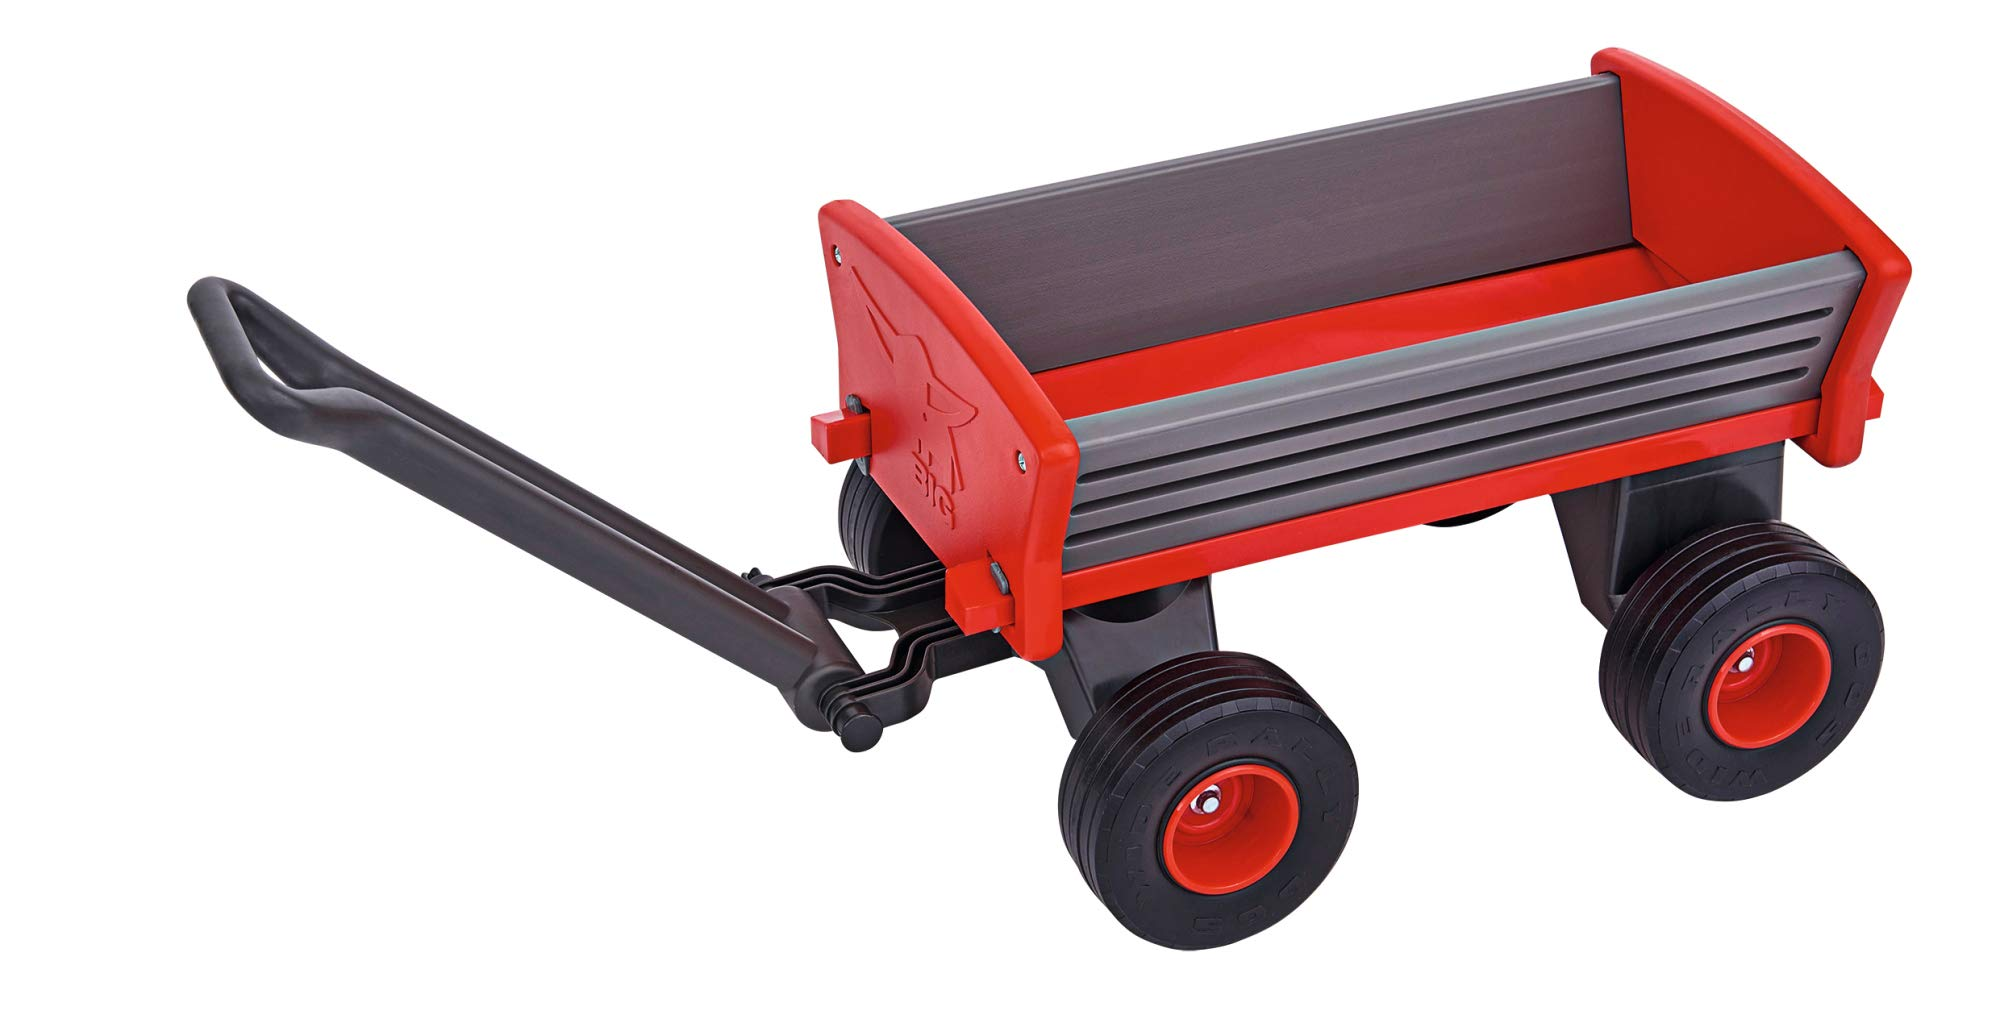 BIG Spielwarenfabrik Big-Peppy 800056602 Hand Trolley Grey/Black/Red